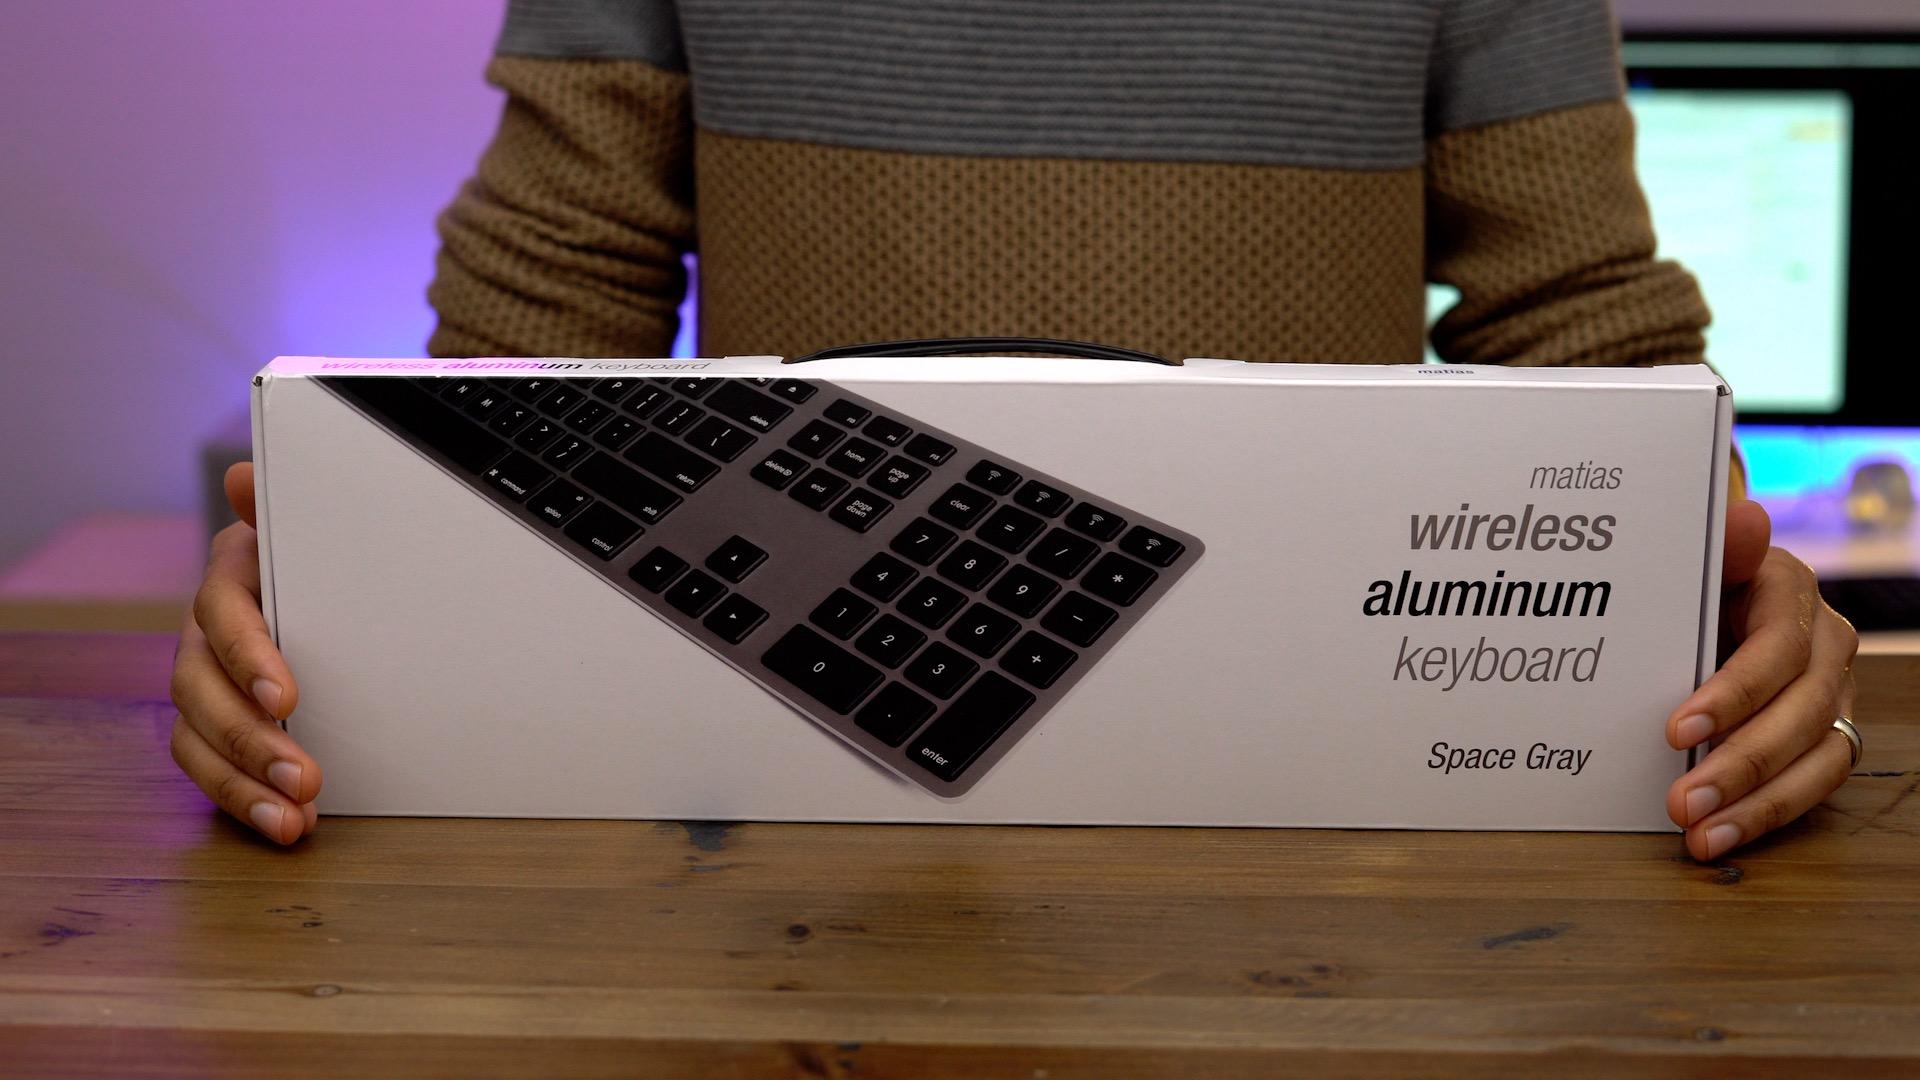 matias-wireless-aluminum-keyboard